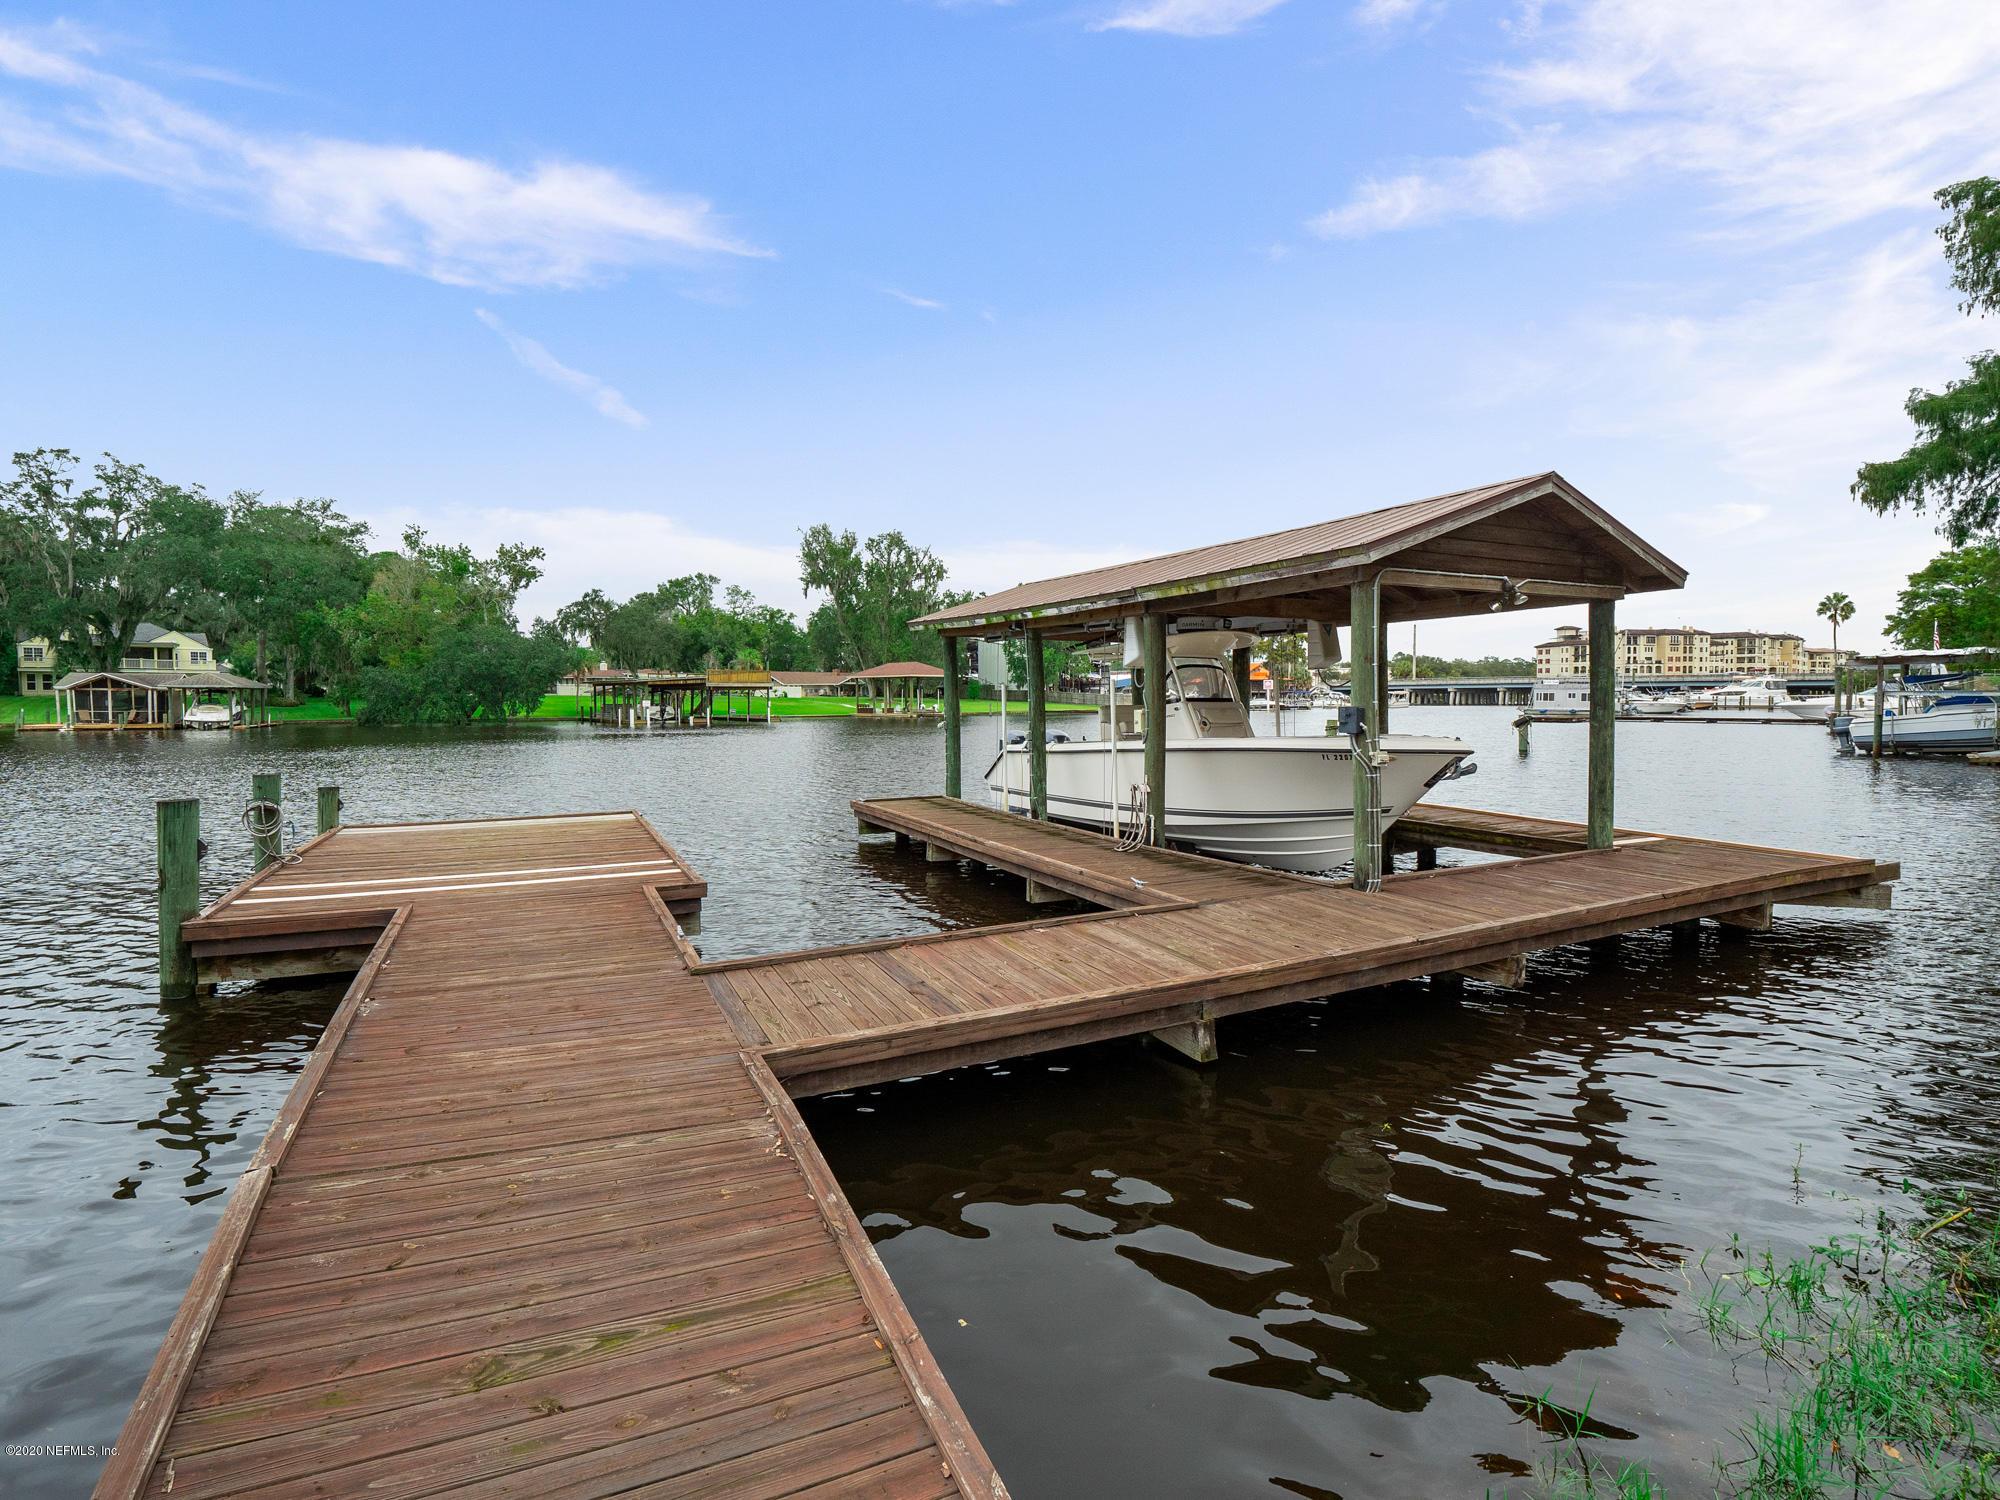 3715 RUBIN, JACKSONVILLE, FLORIDA 32257, 4 Bedrooms Bedrooms, ,4 BathroomsBathrooms,Residential,For sale,RUBIN,1079583